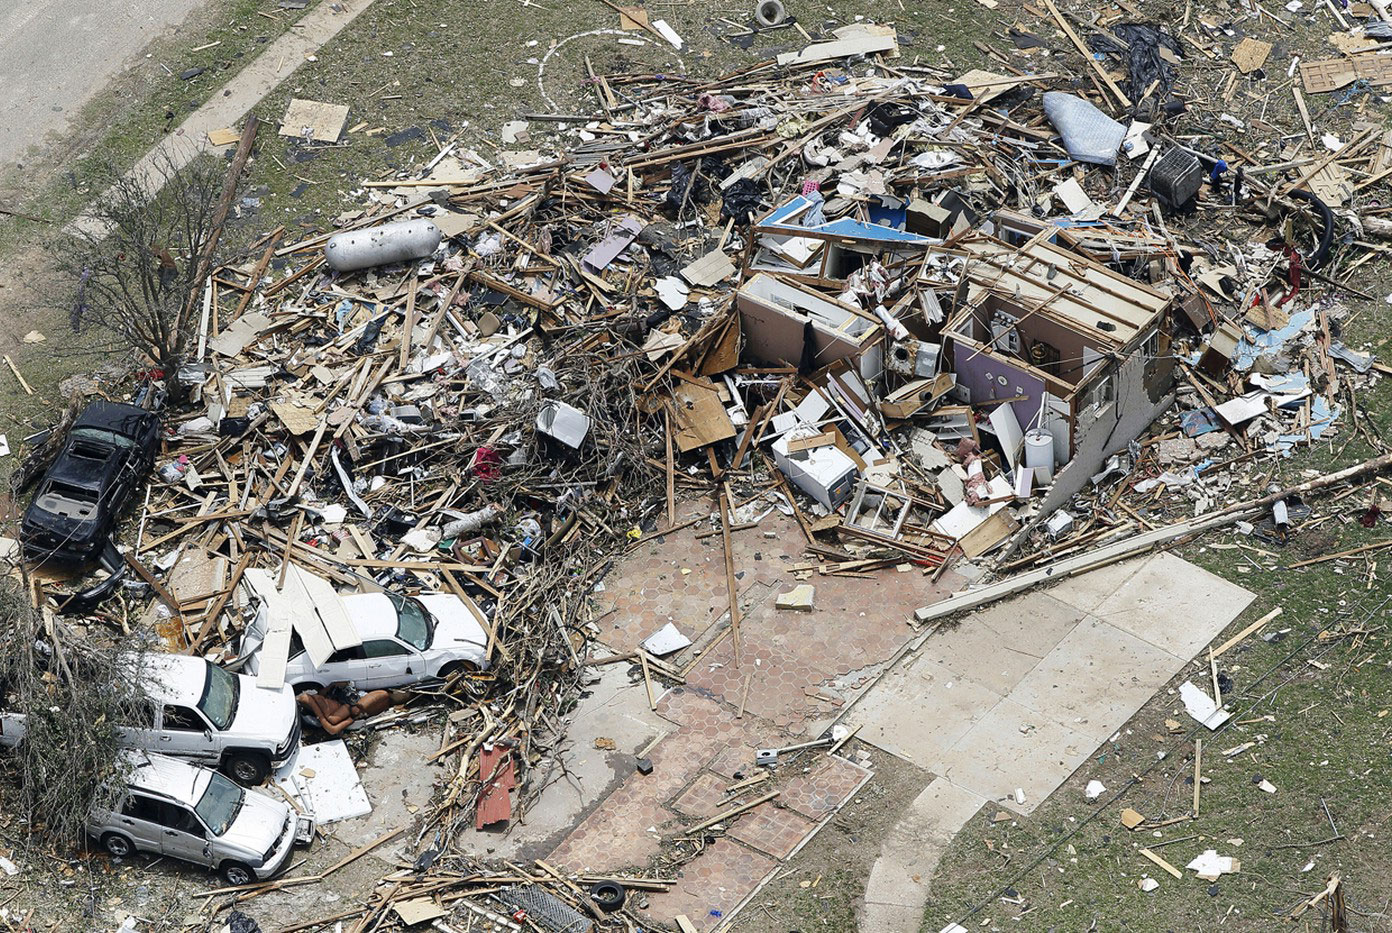 разрушения в округе Худ, Техас